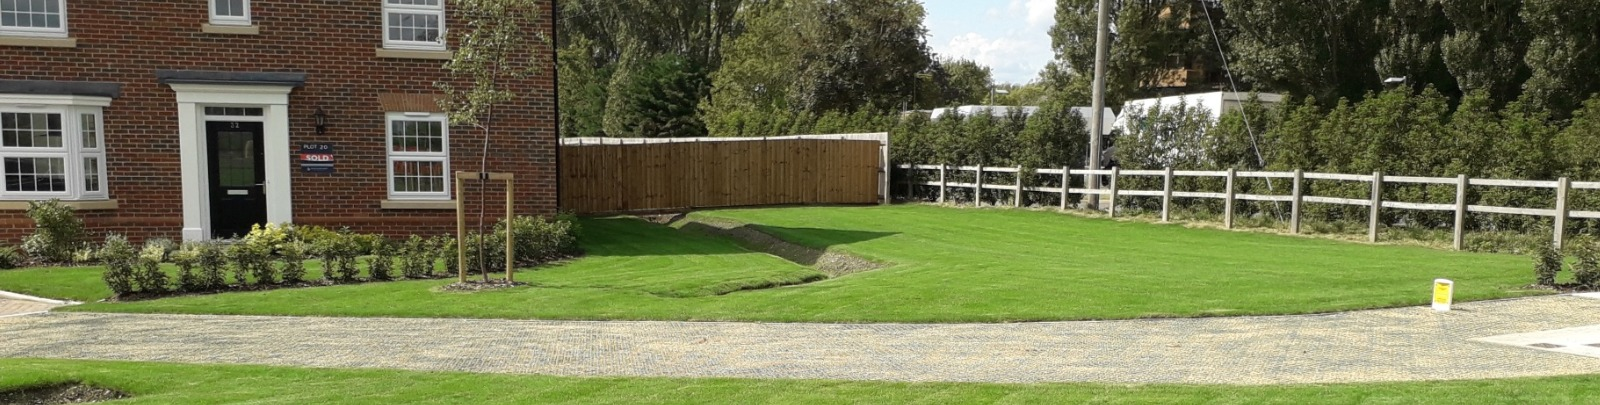 hickman brothers landscapes ltd  burford  oxfordshire design  u0026 construction